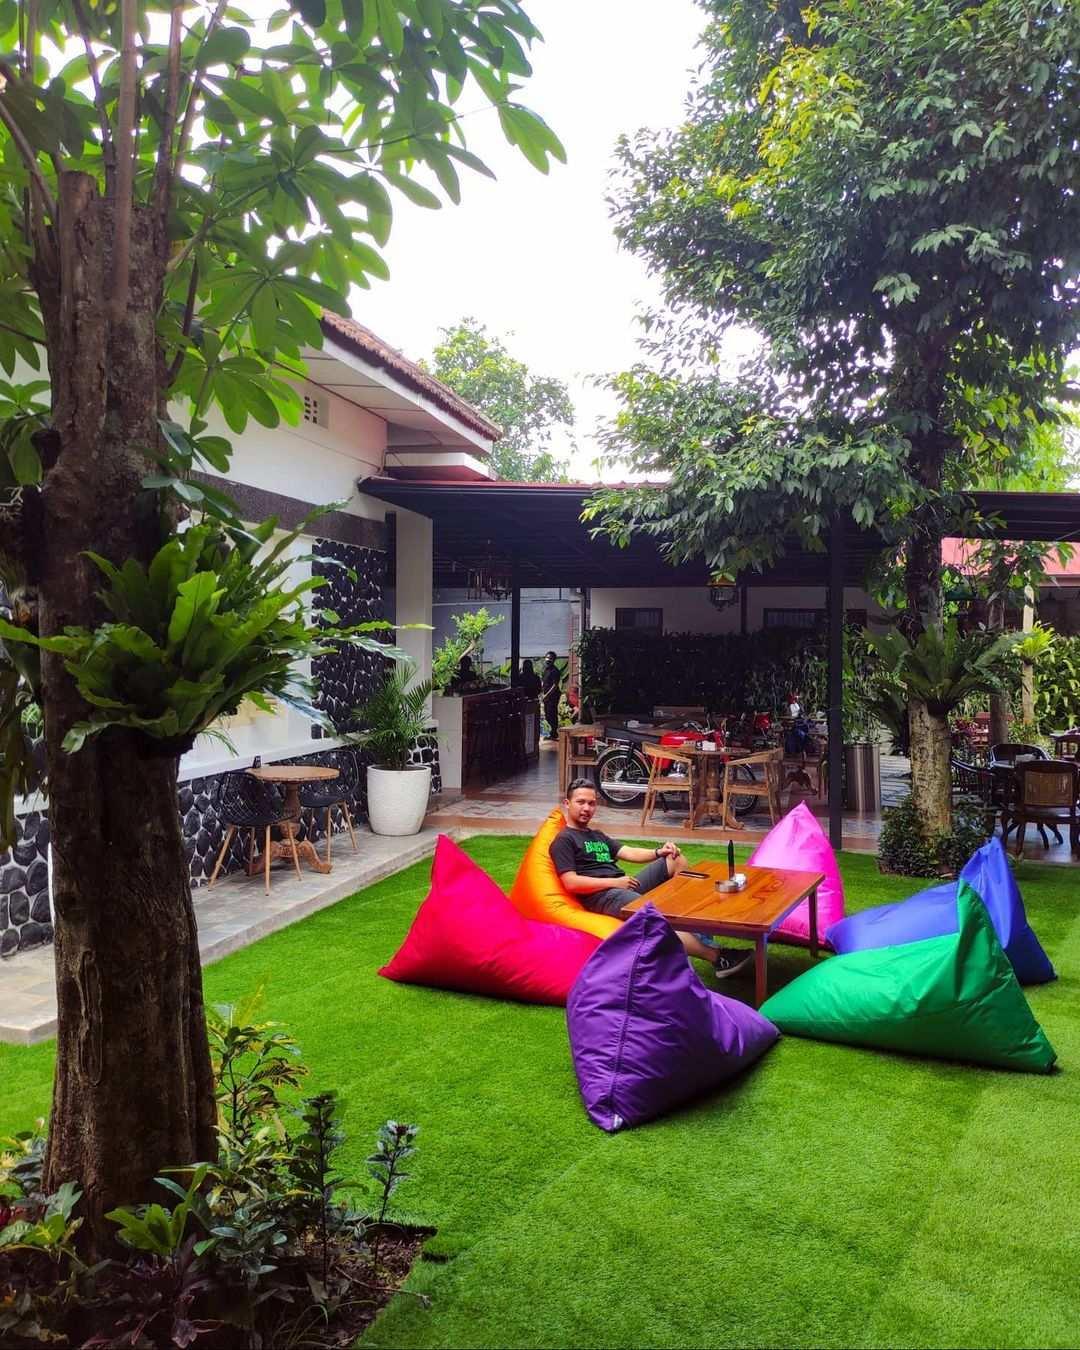 Bersantai di Bagian Outdoor di Cafe Kalaras Heritage Bogor Image From @enjoybogor